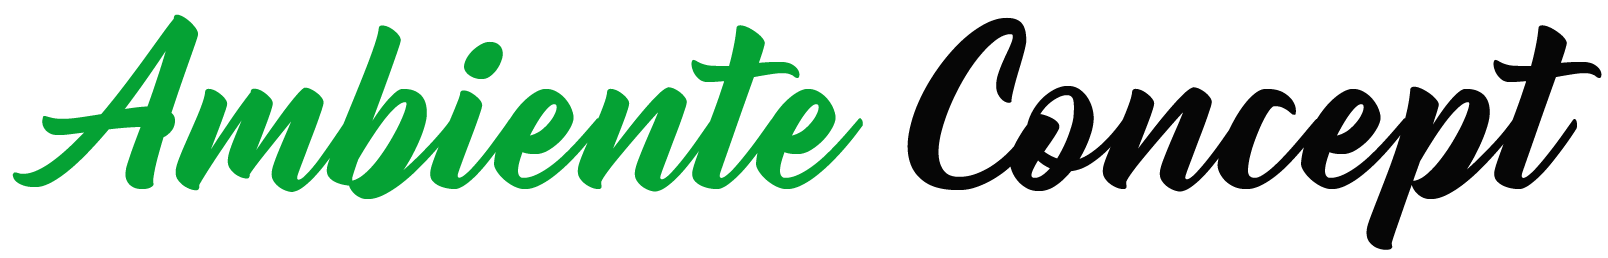 LifeStyler-Netzwerk.de